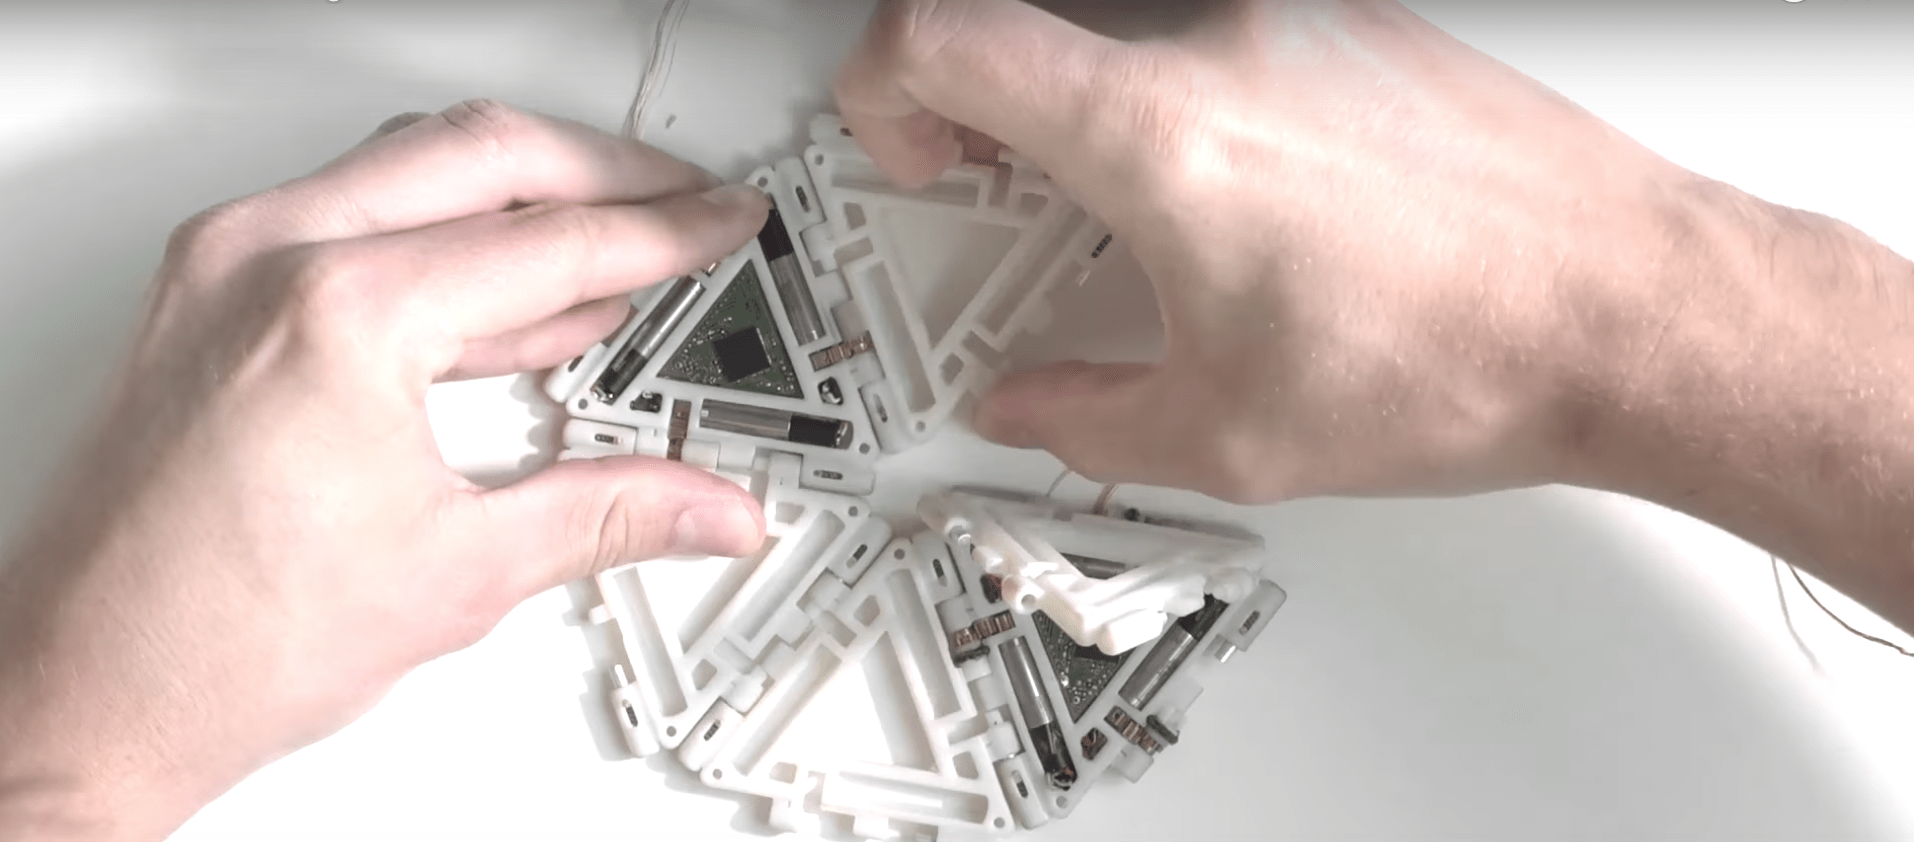 TheMerkle Mori Origami Modular Robot